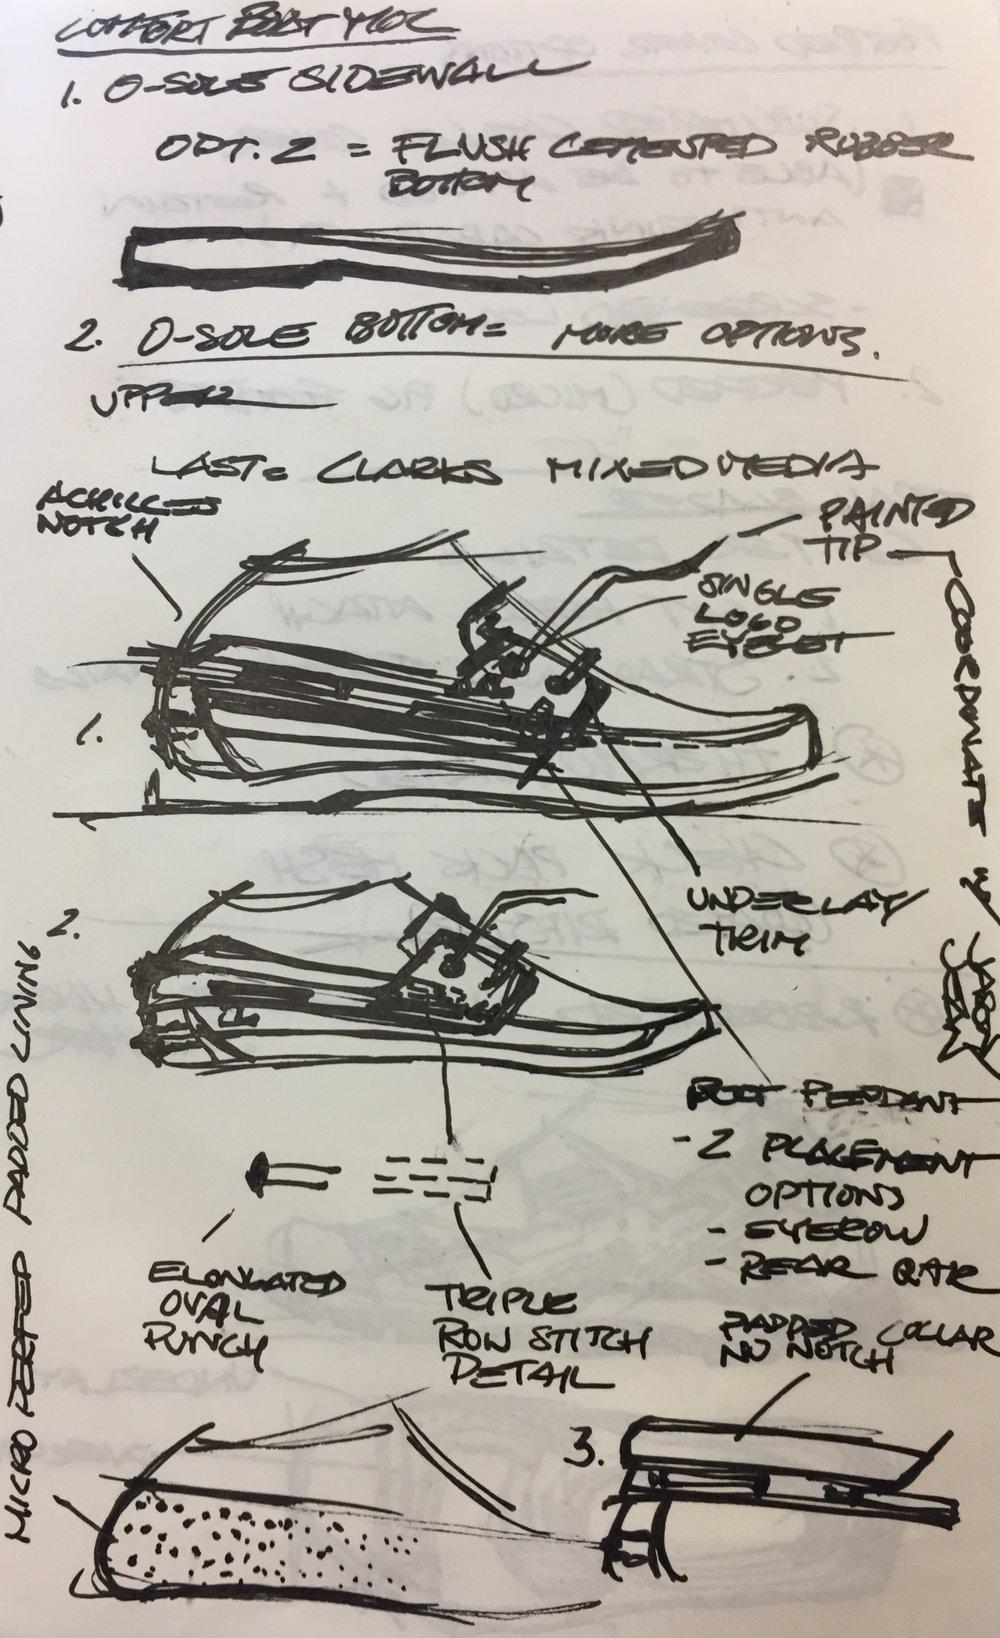 Comfort Boat Moc Thumbnail Sketches